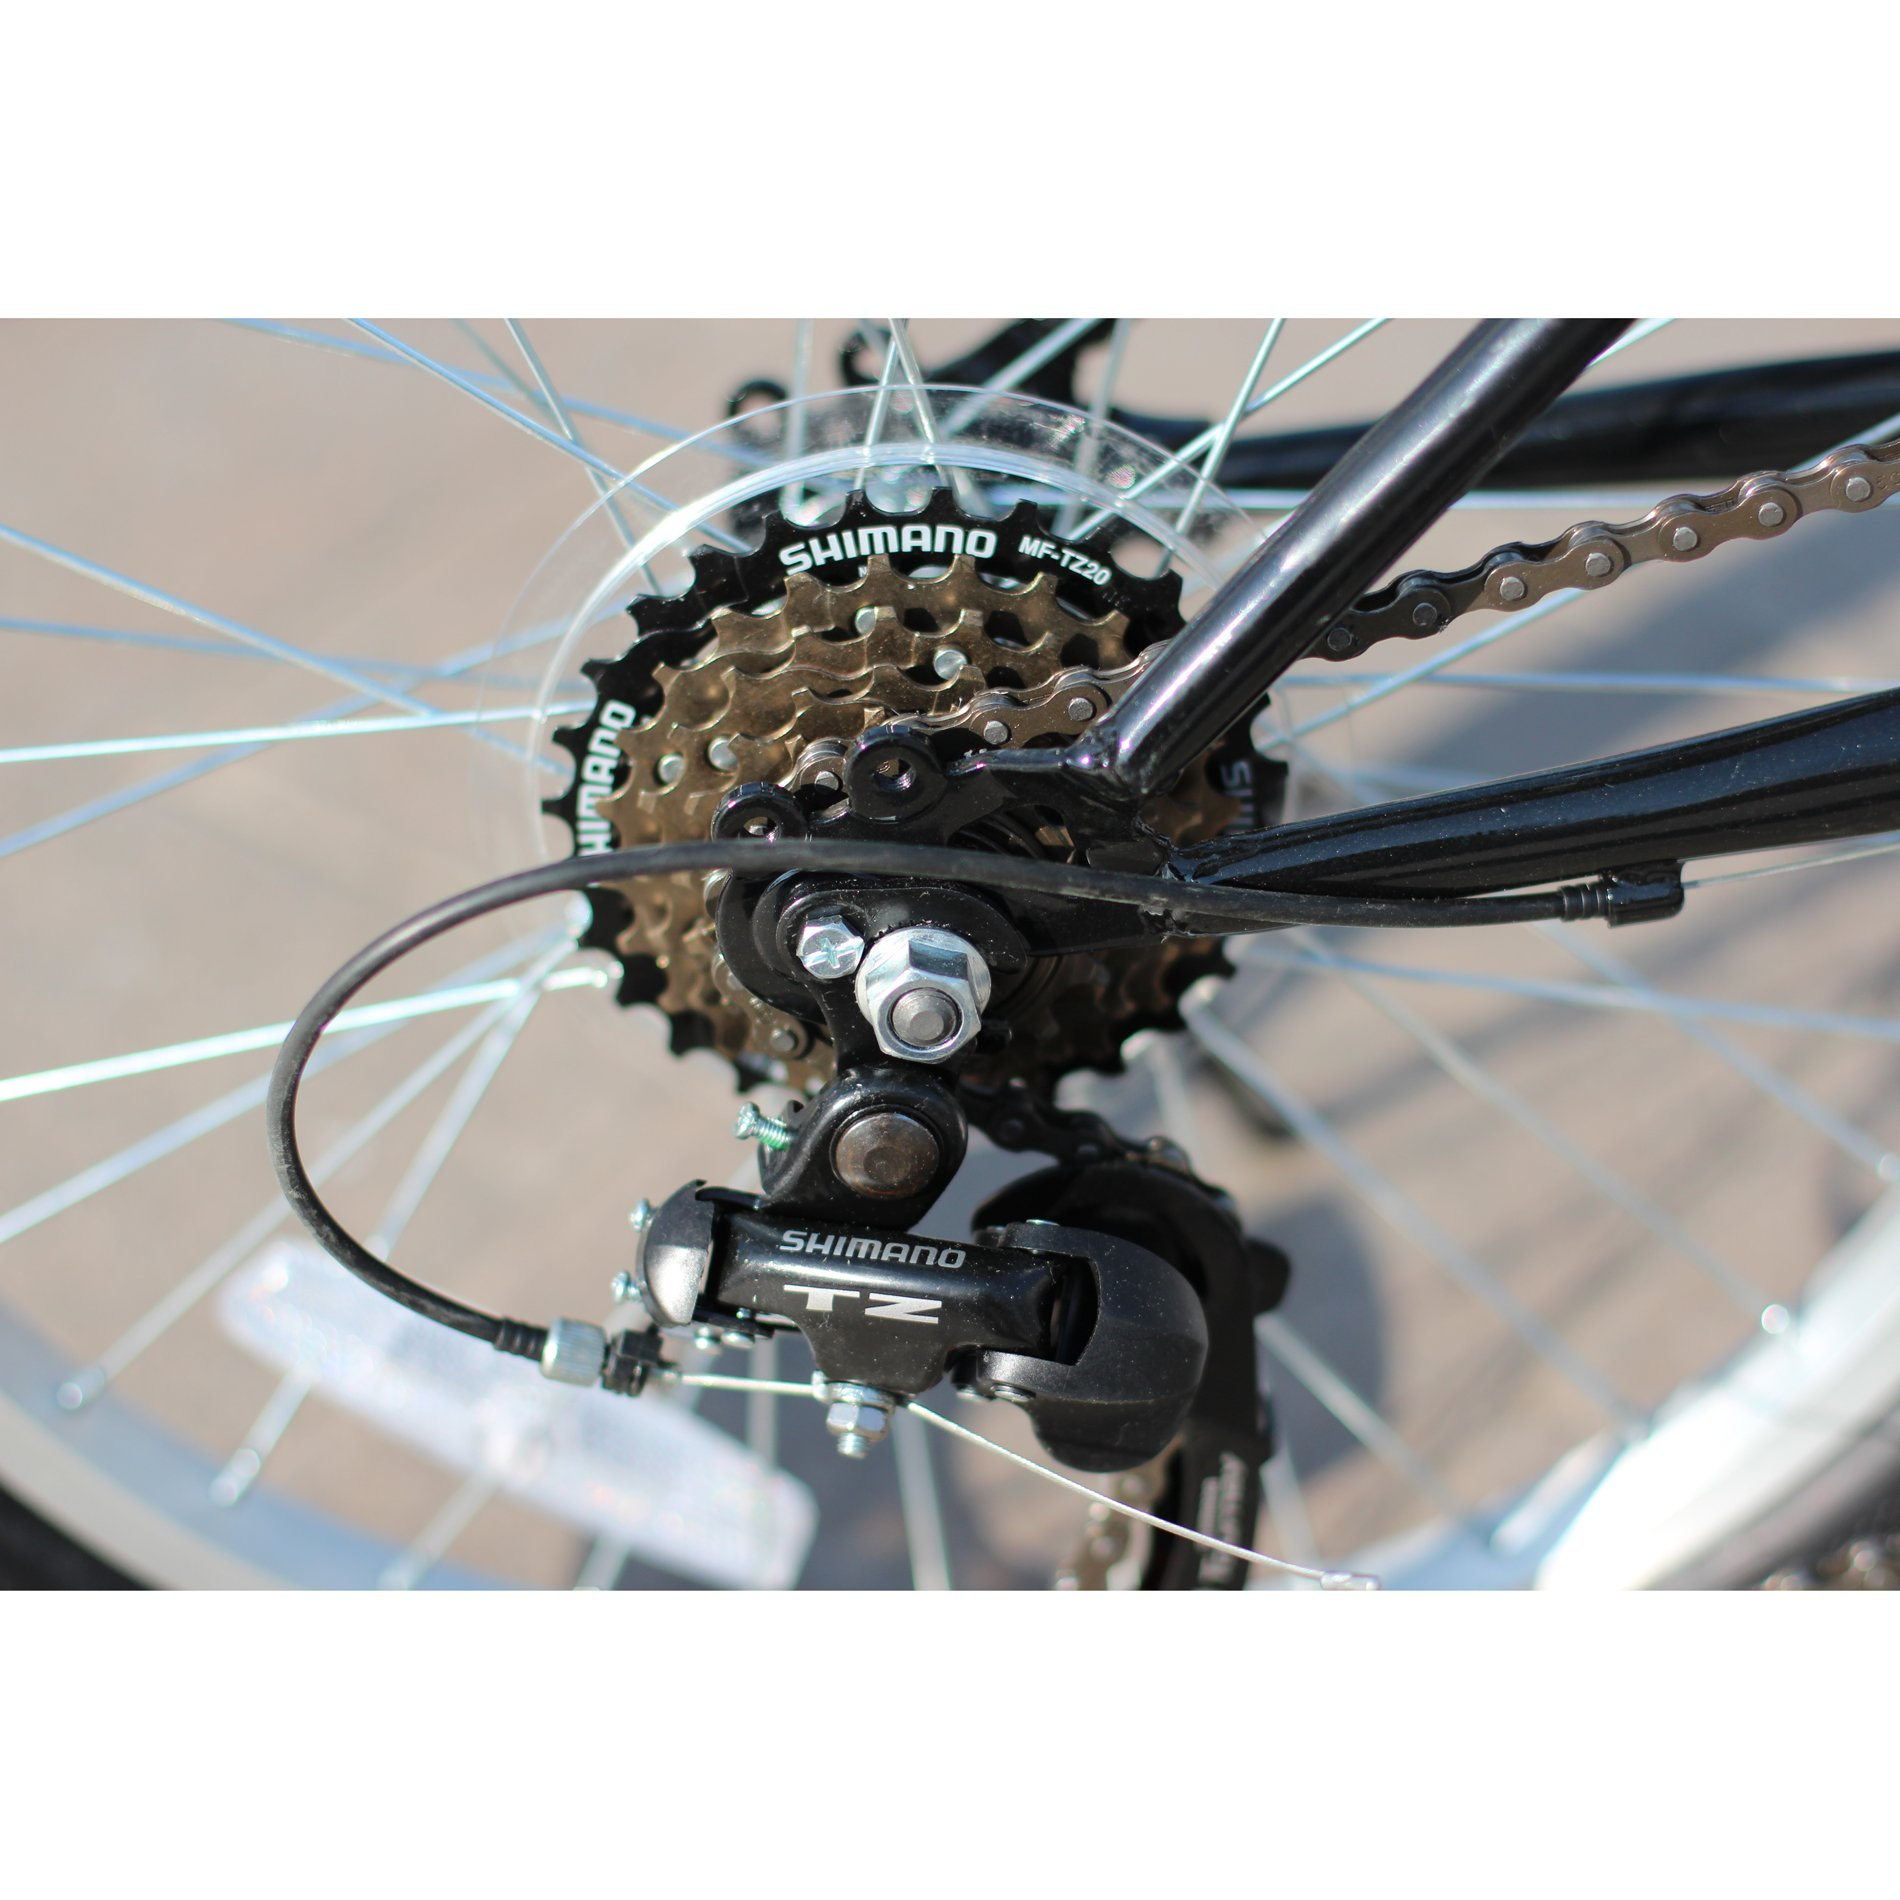 IDS Home Unyousual U Arc Folding City Bike Bicycle 6 Speed Steel Frame Shimano Gear Wanda Tire, Black by IDS Home (Image #6)